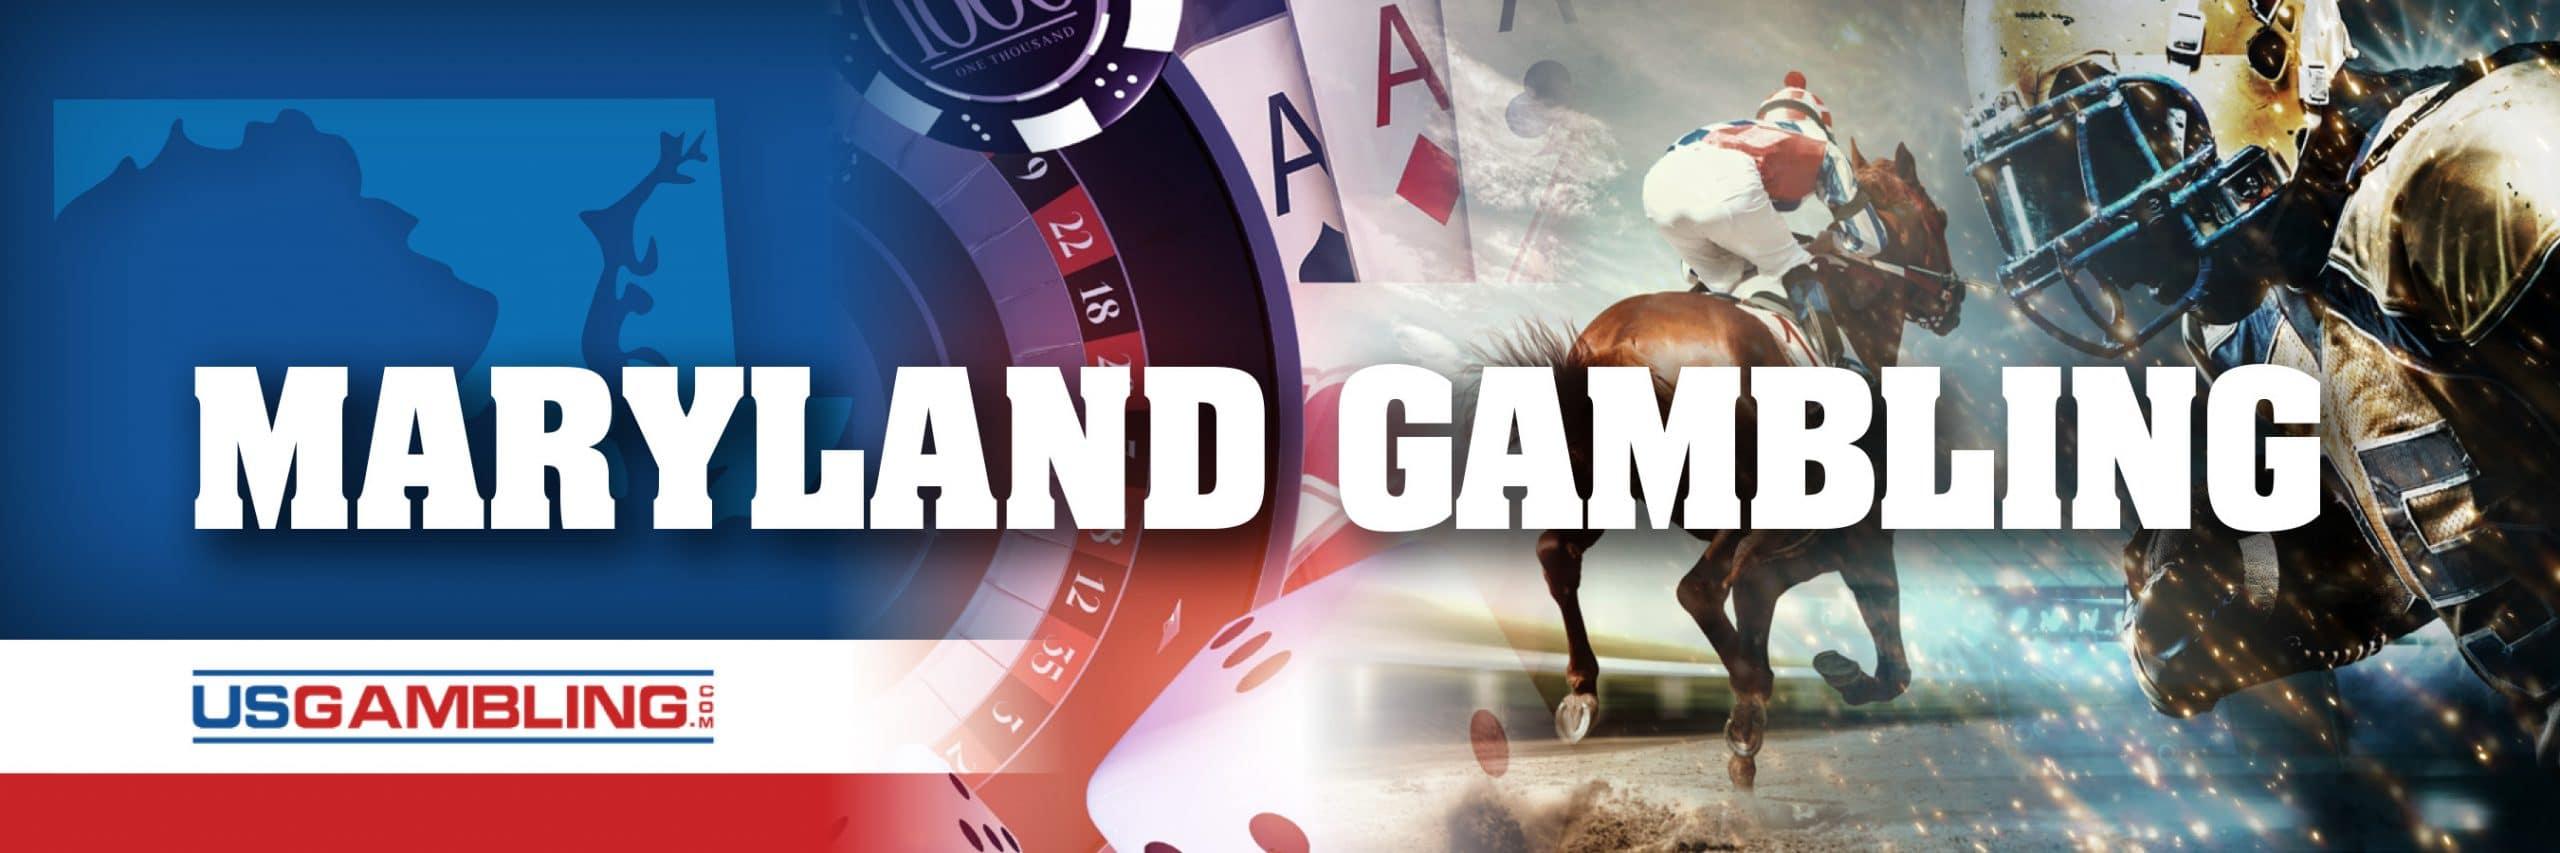 Legal Maryland Gambling